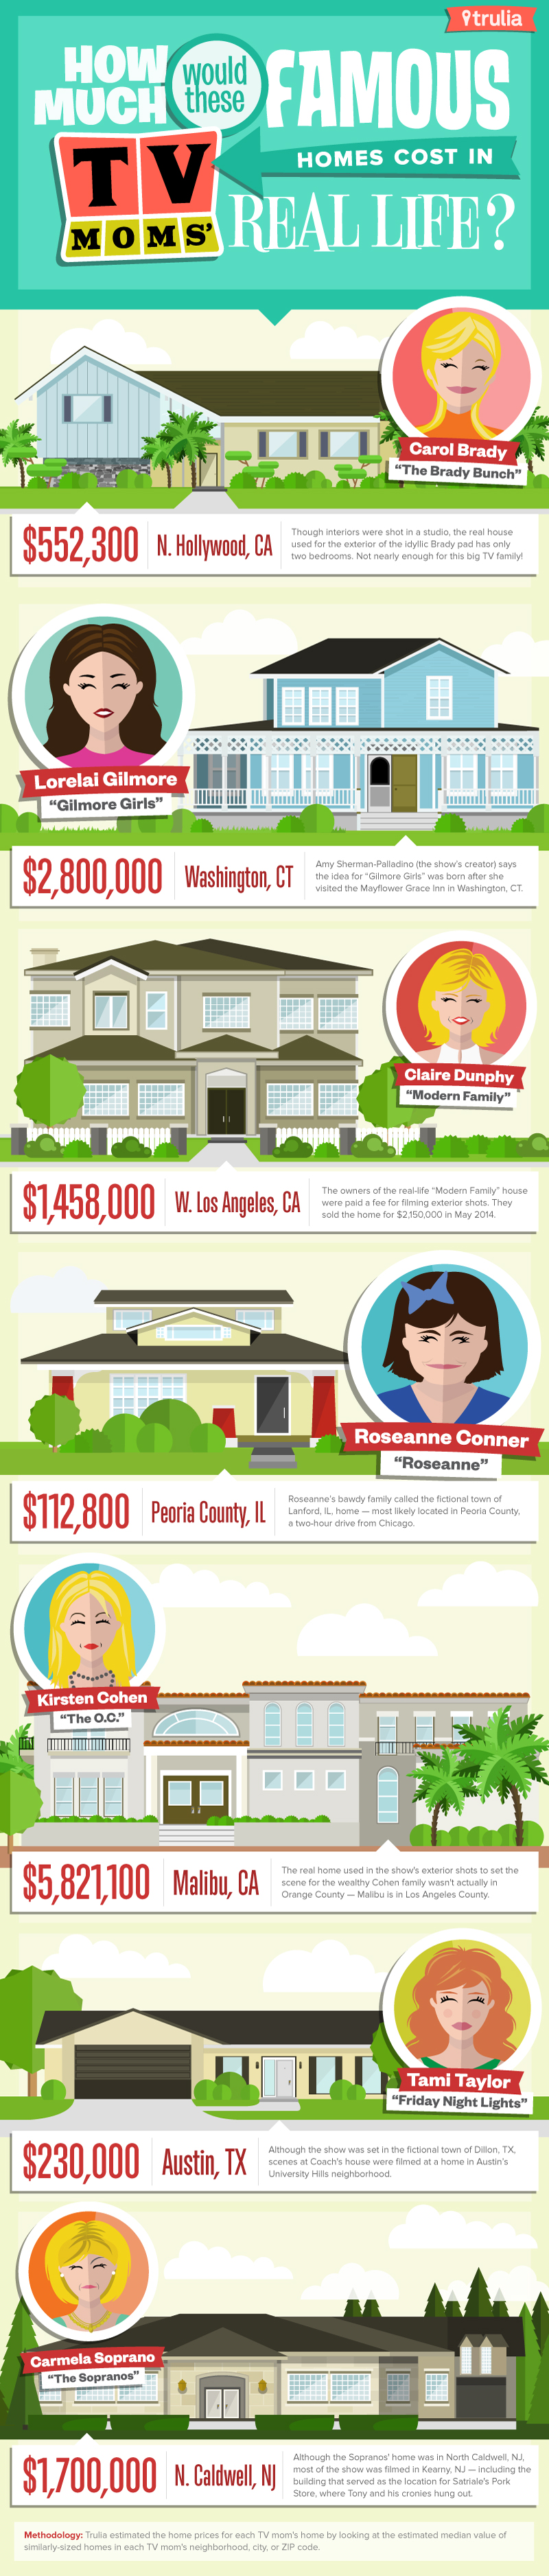 Trulia-Miles-Quillen-Infographic-Famous-TV-Moms-Homes